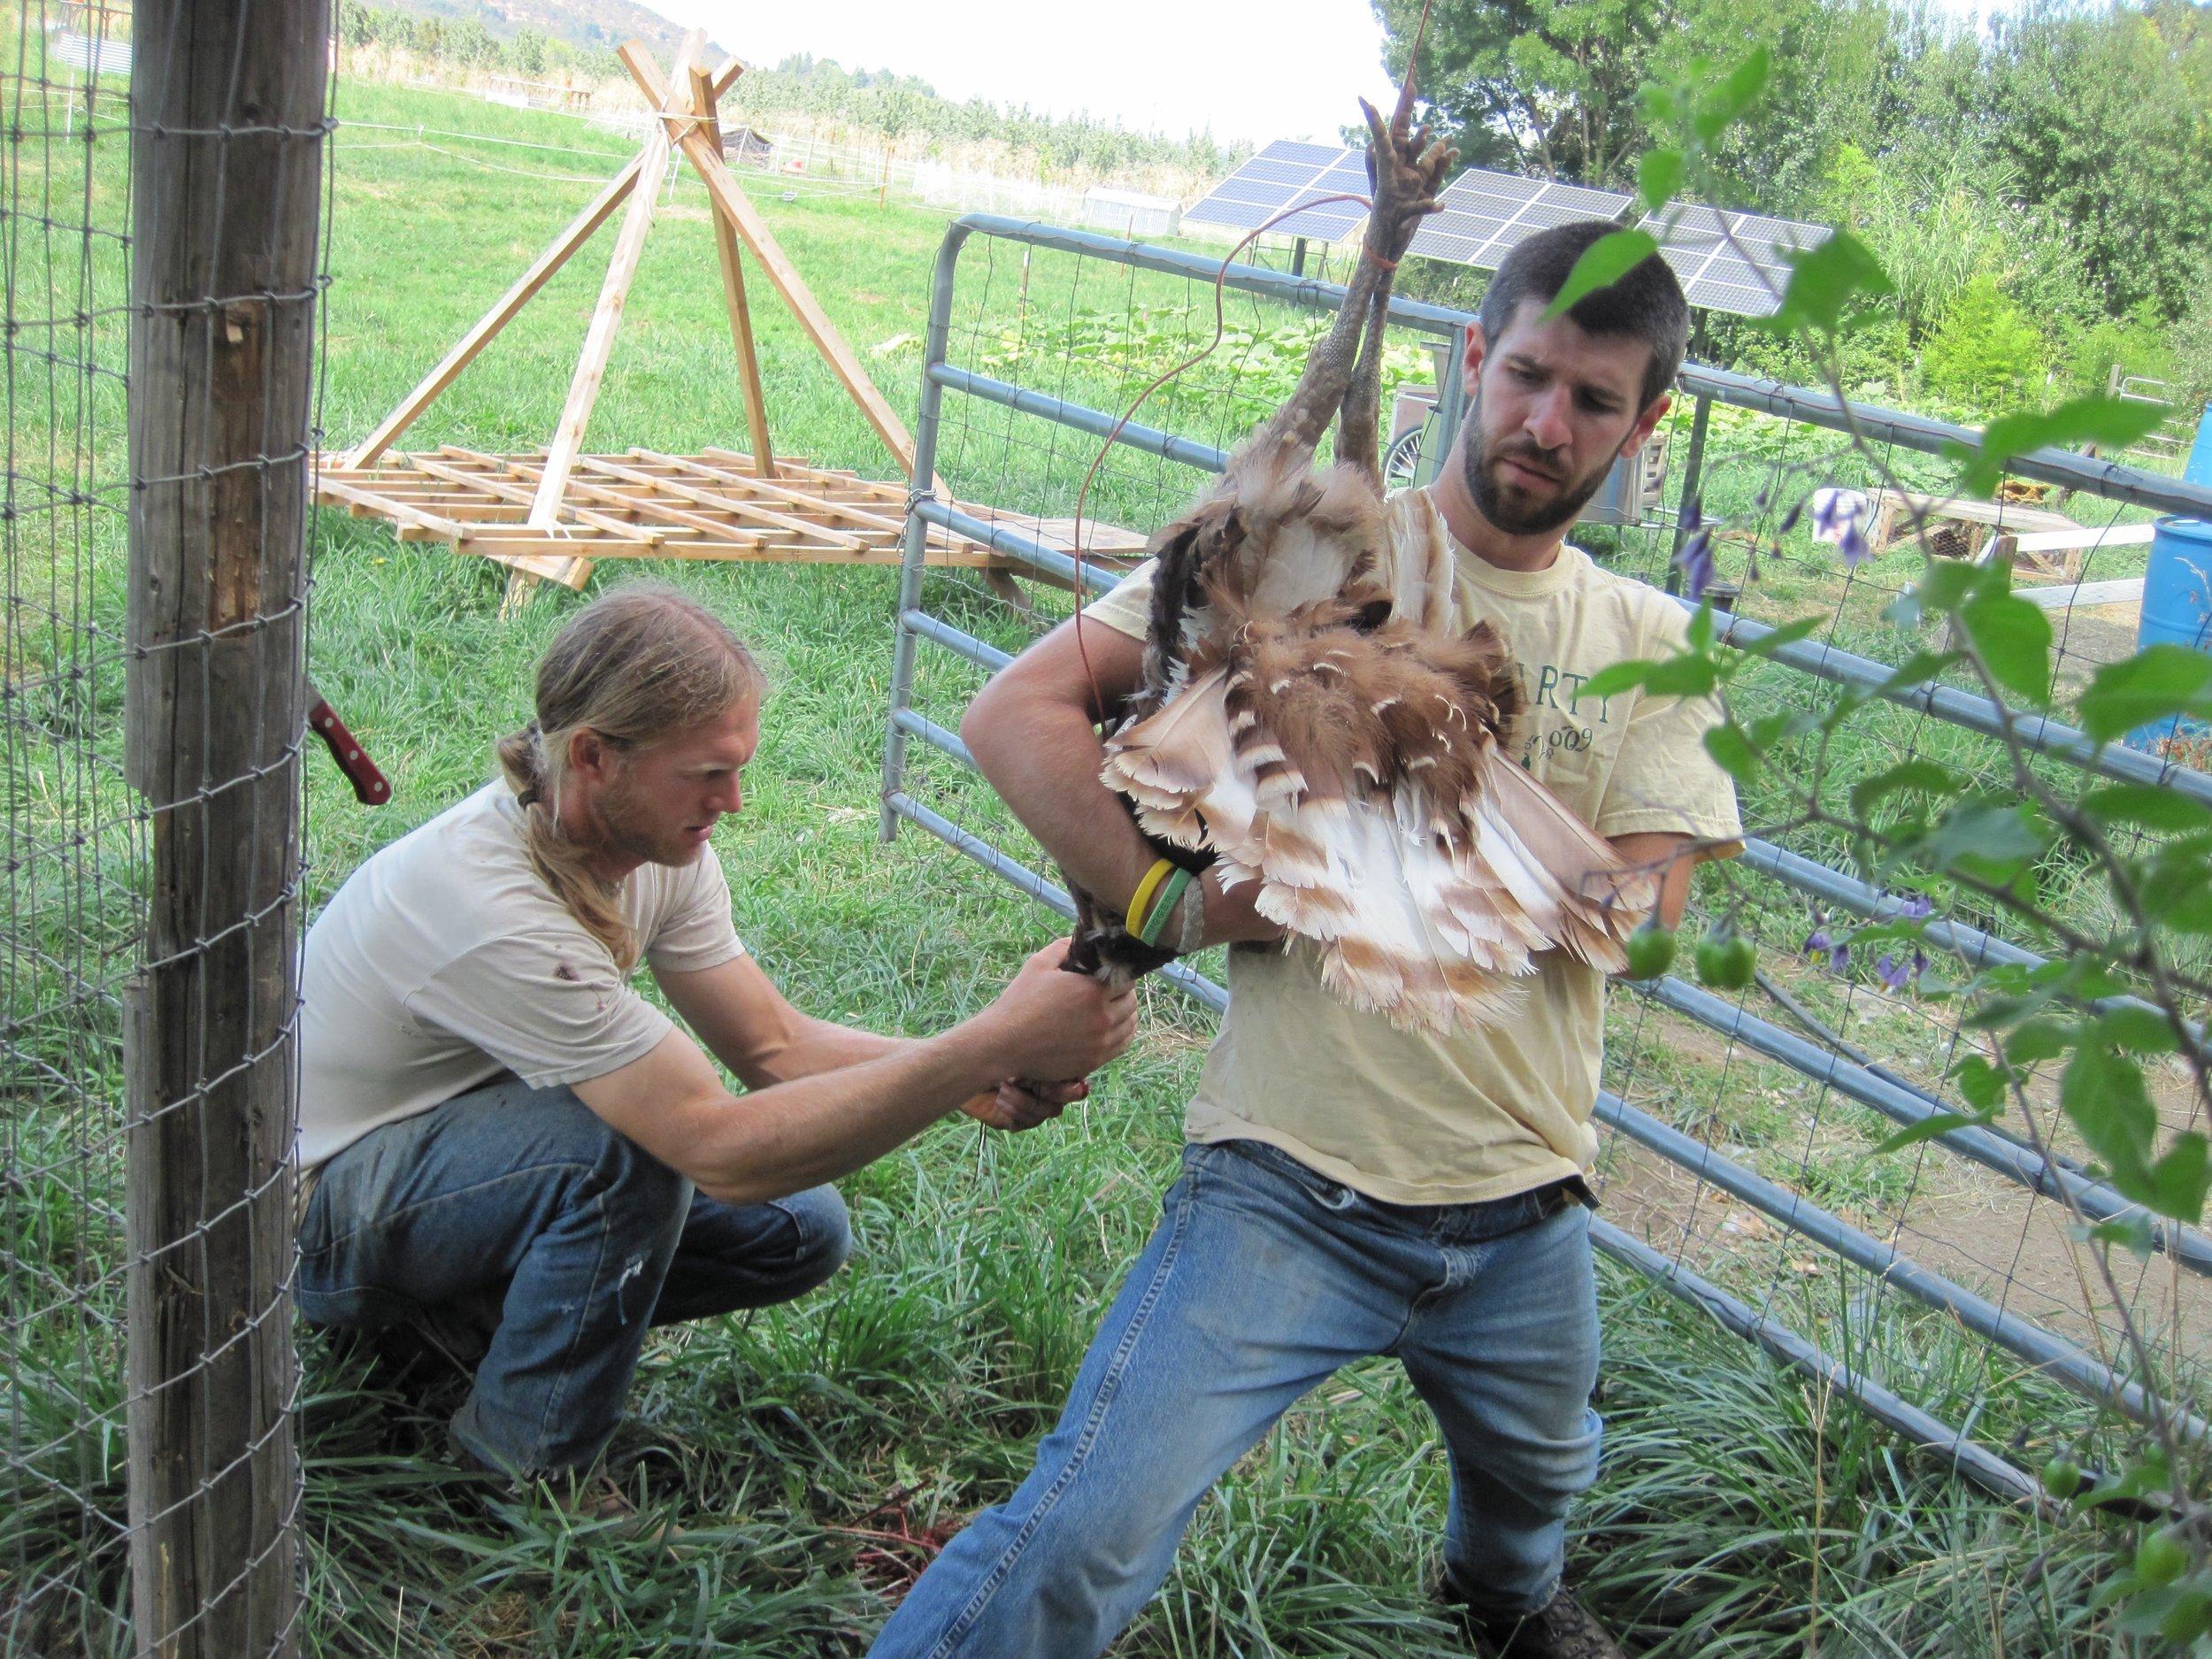 Ian West holding one of the turkeys.